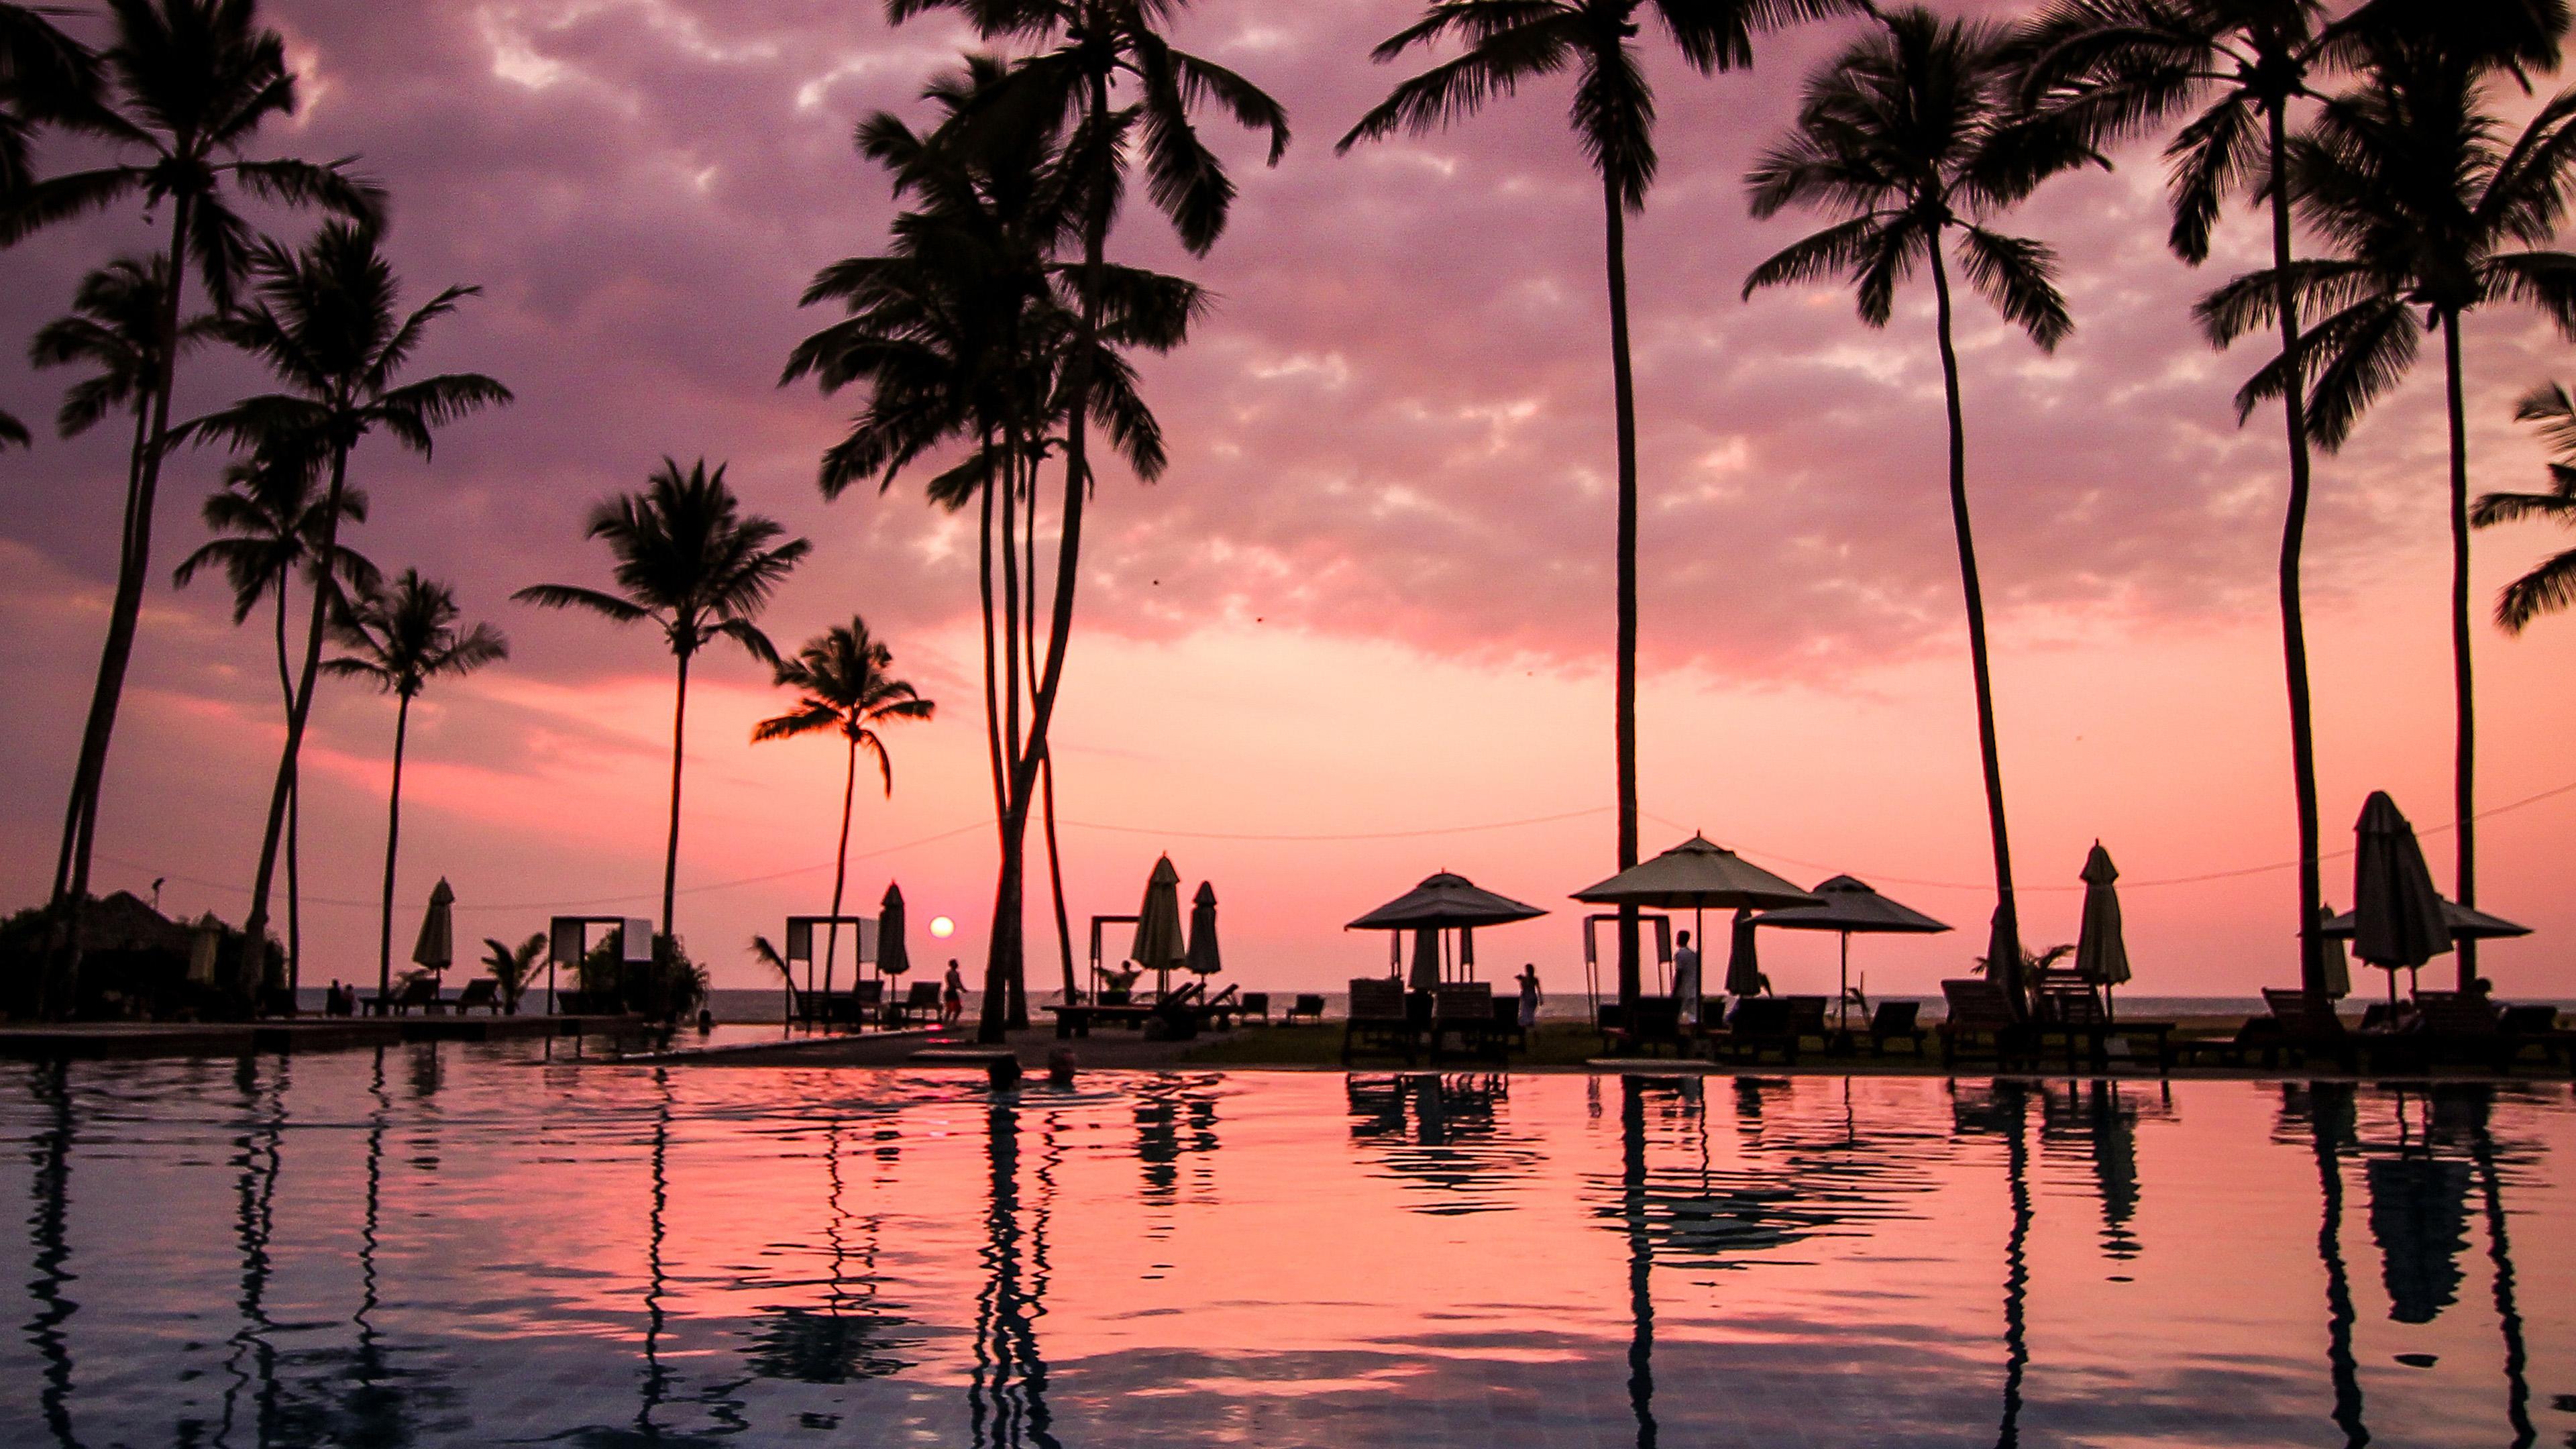 nd09-vacation-sunset-beach-happy-wallpaper